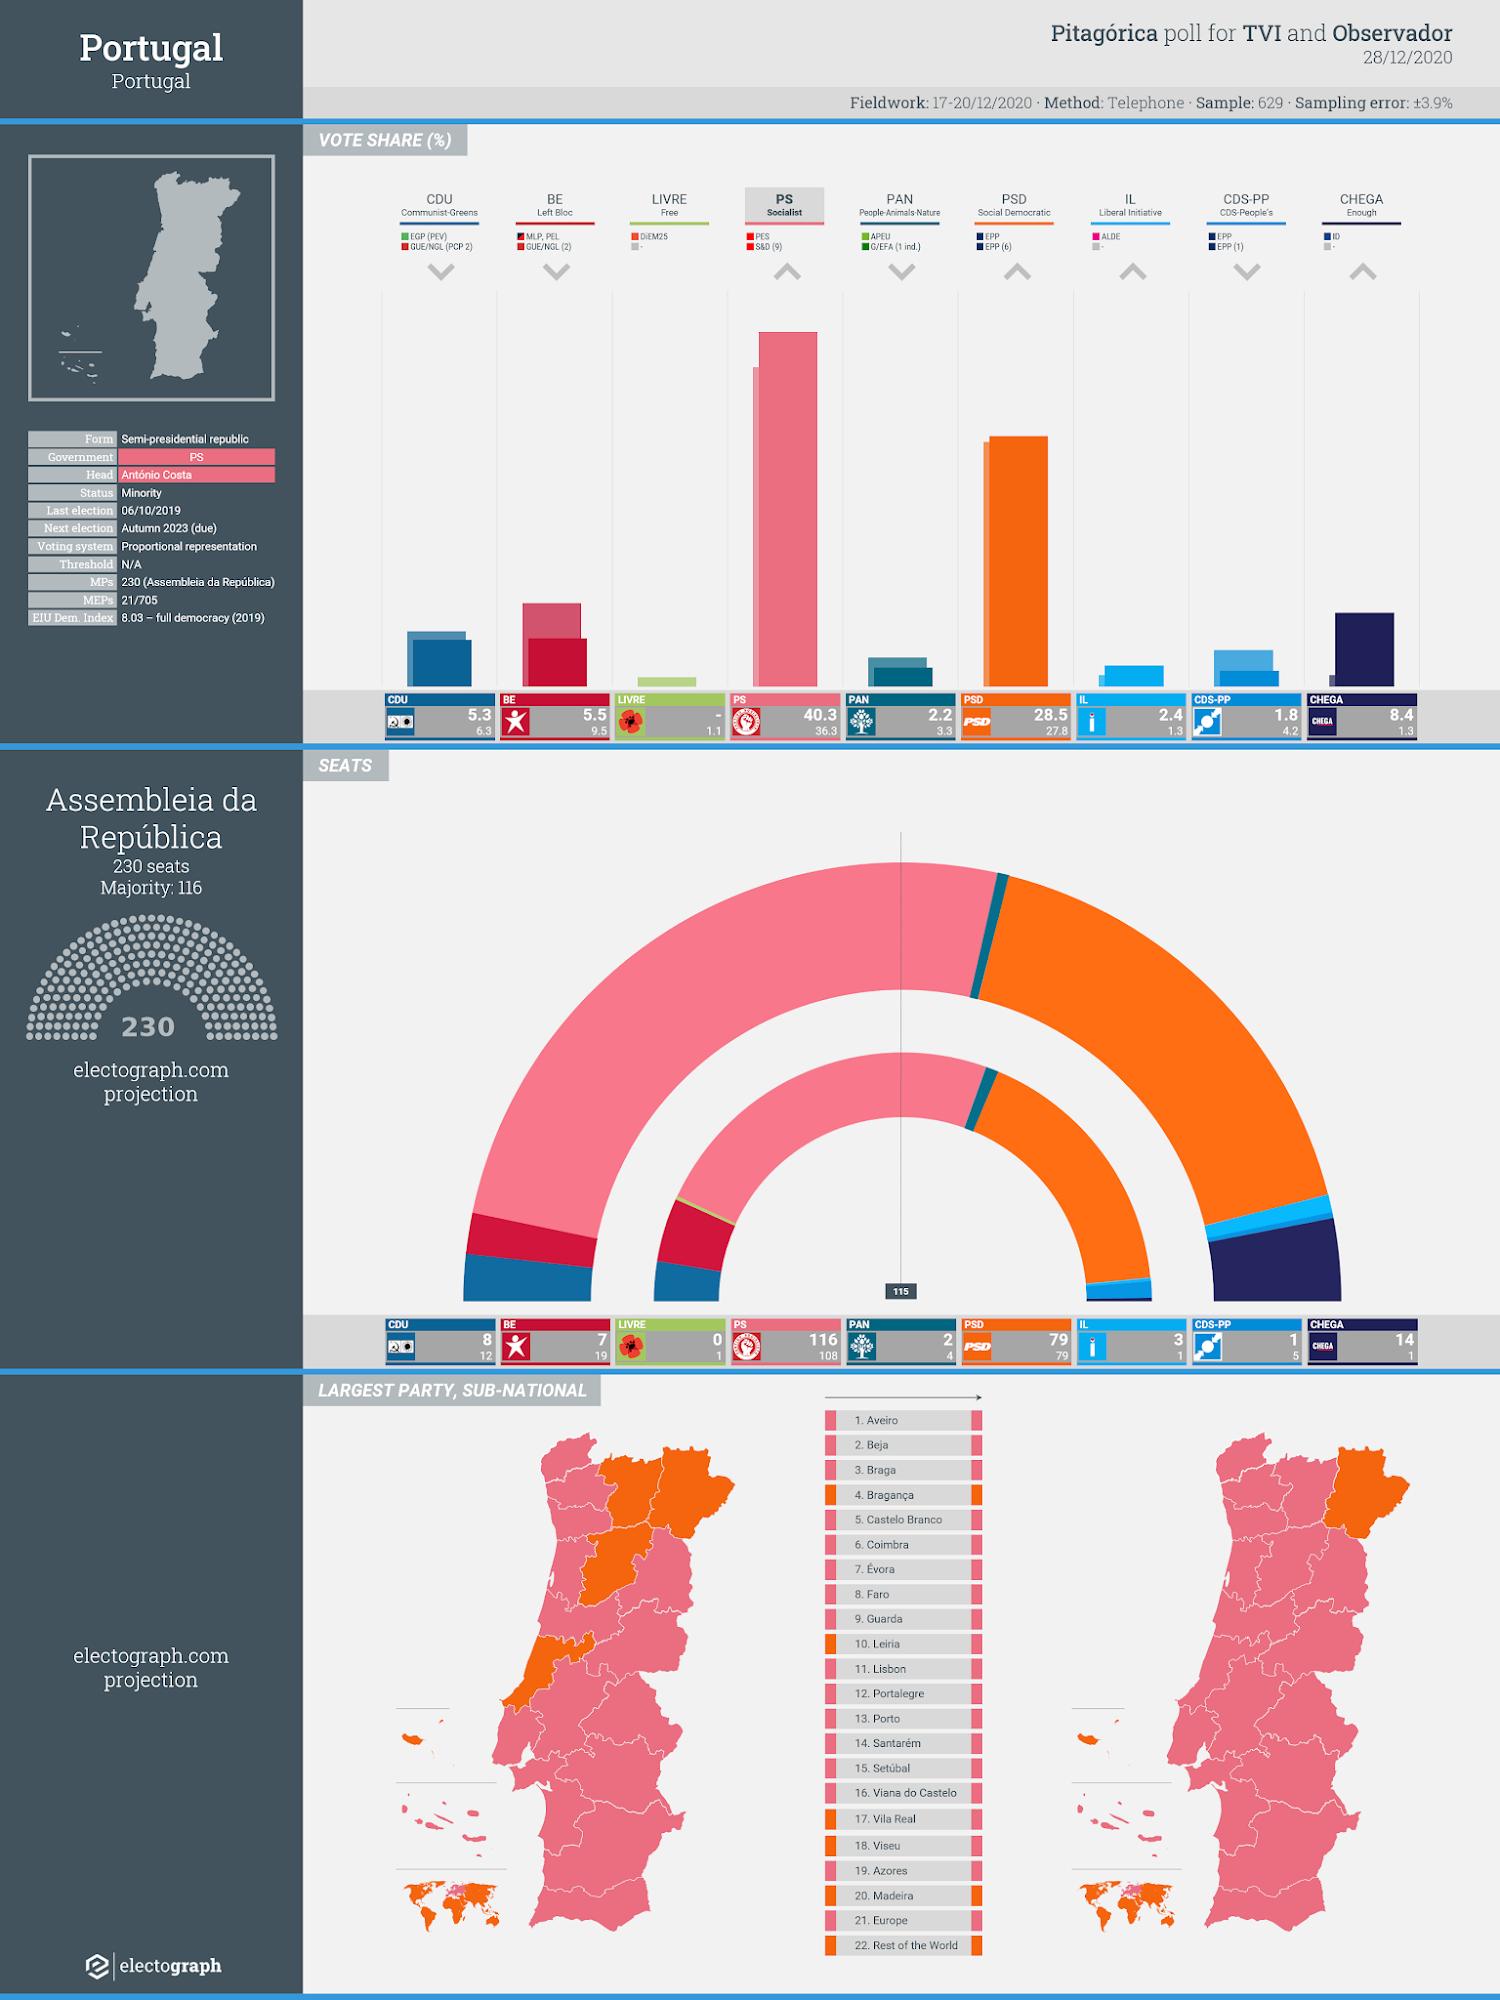 PORTUGAL: Pitagórica poll chart for TVI and Observador, 28 December 2020